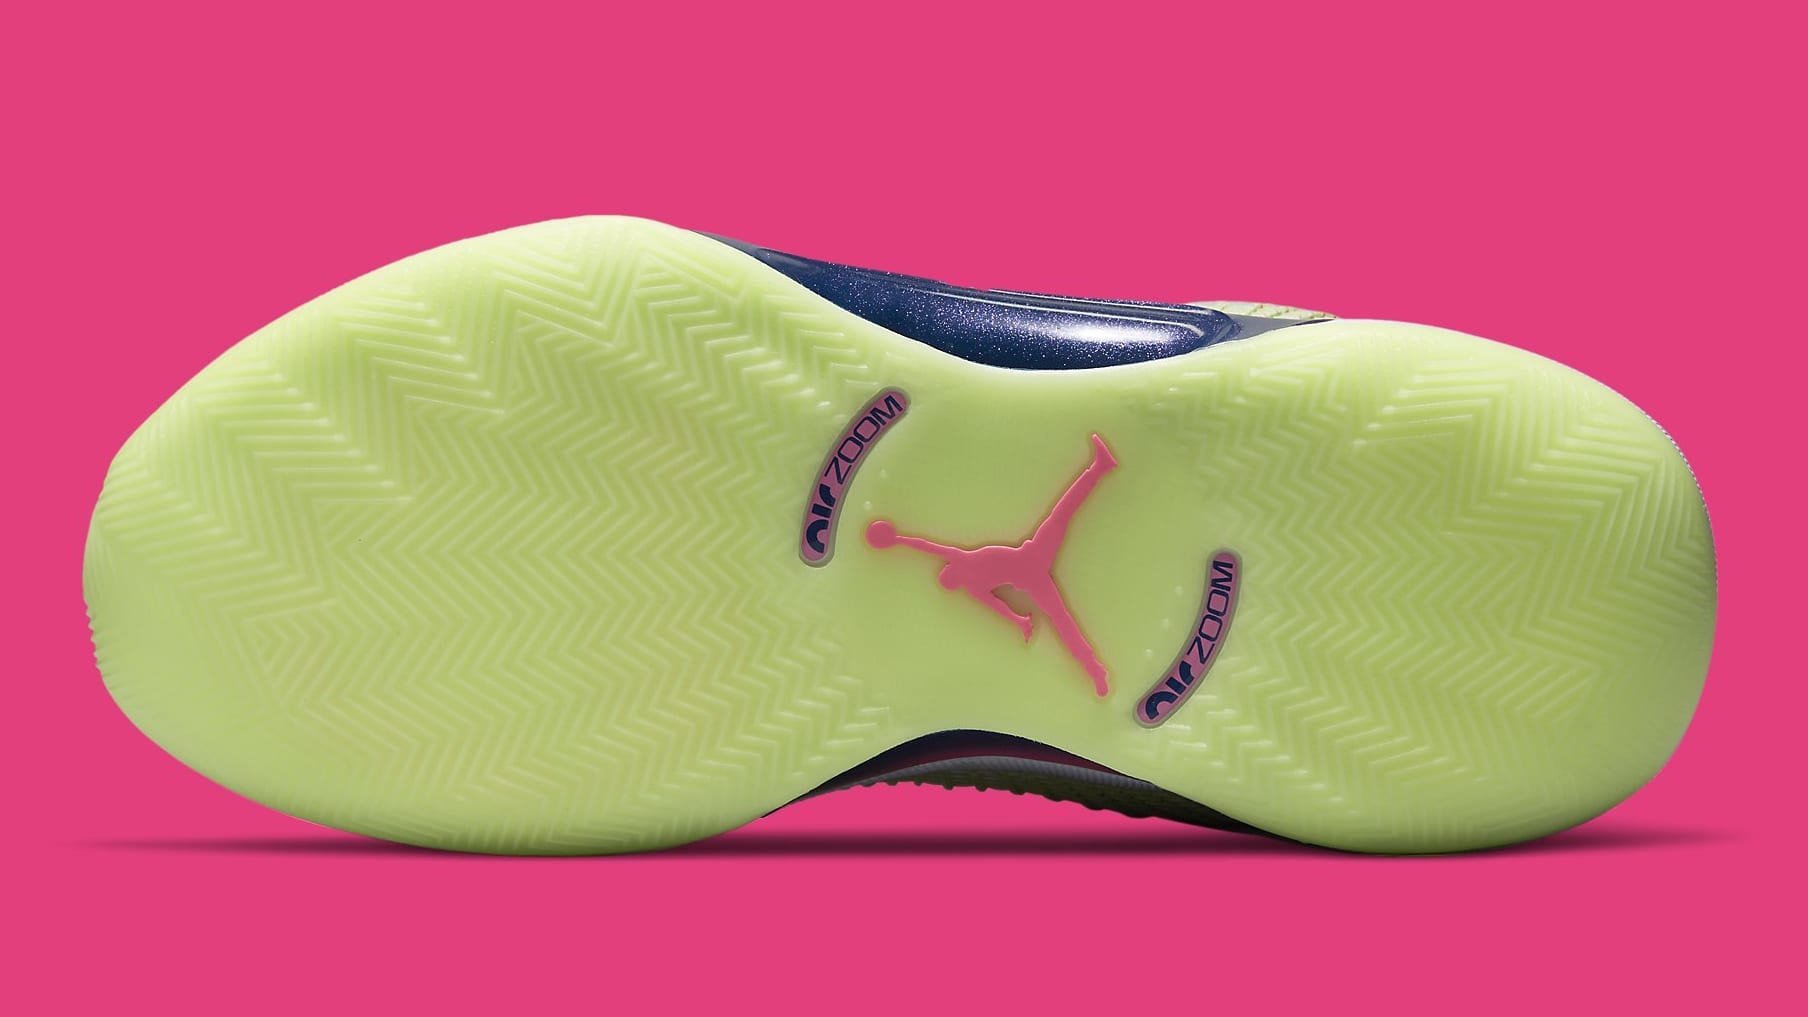 Air Jordan 35 XXXV Luke Doncic PE Release Date DJ9805-190 Sole